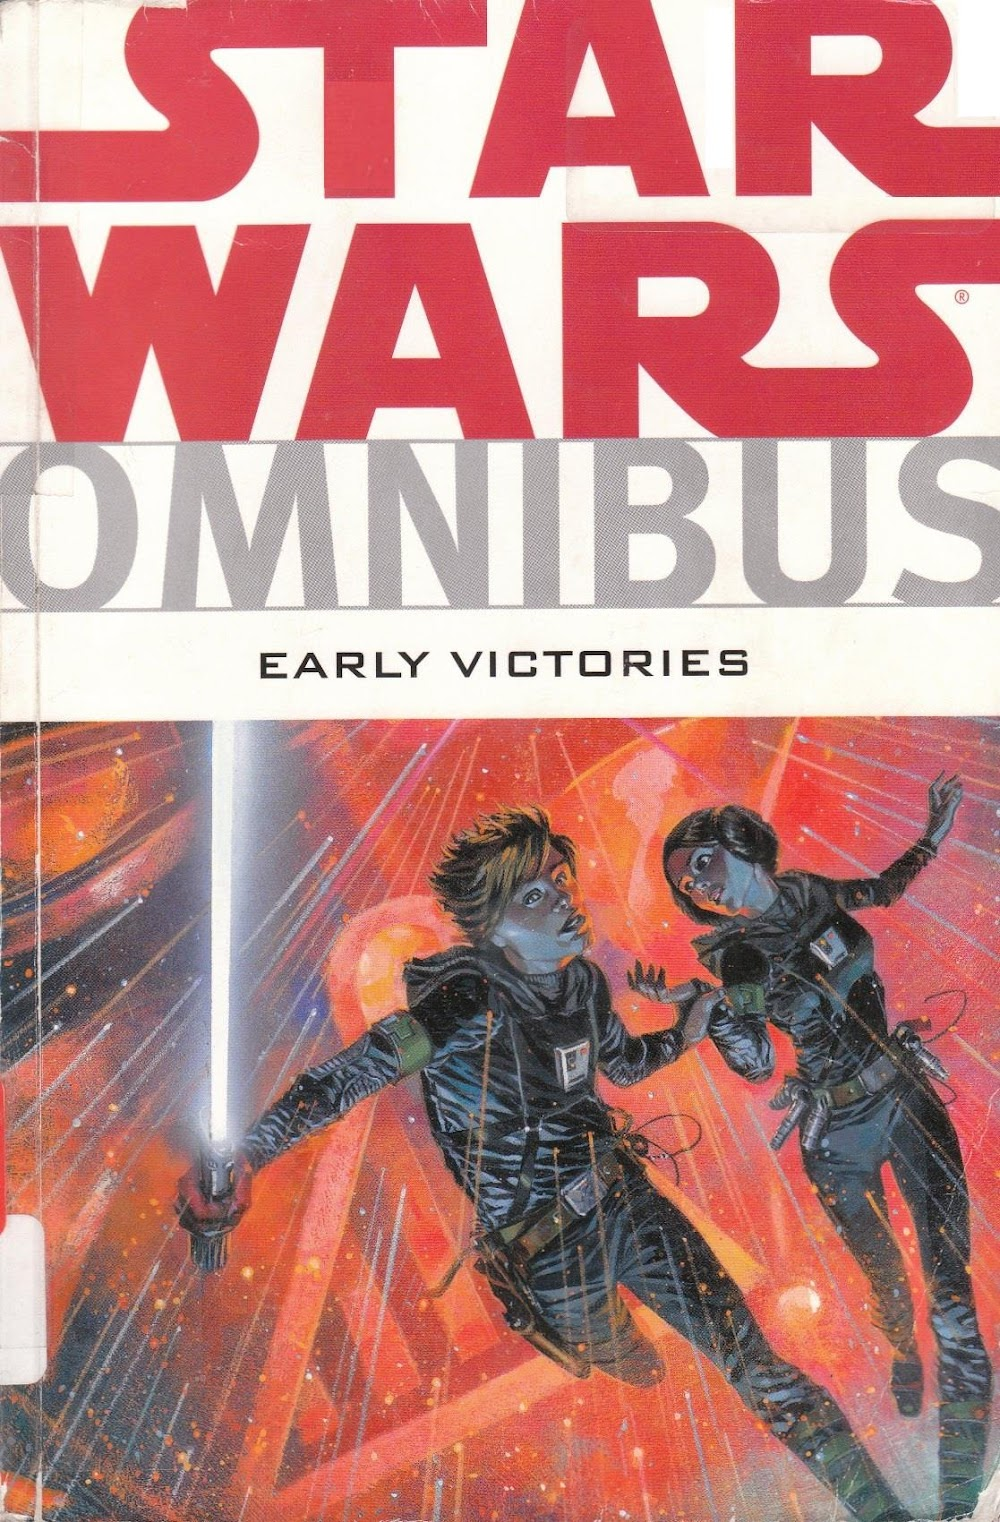 Star Wars Omnibus: Early Victories (2008)